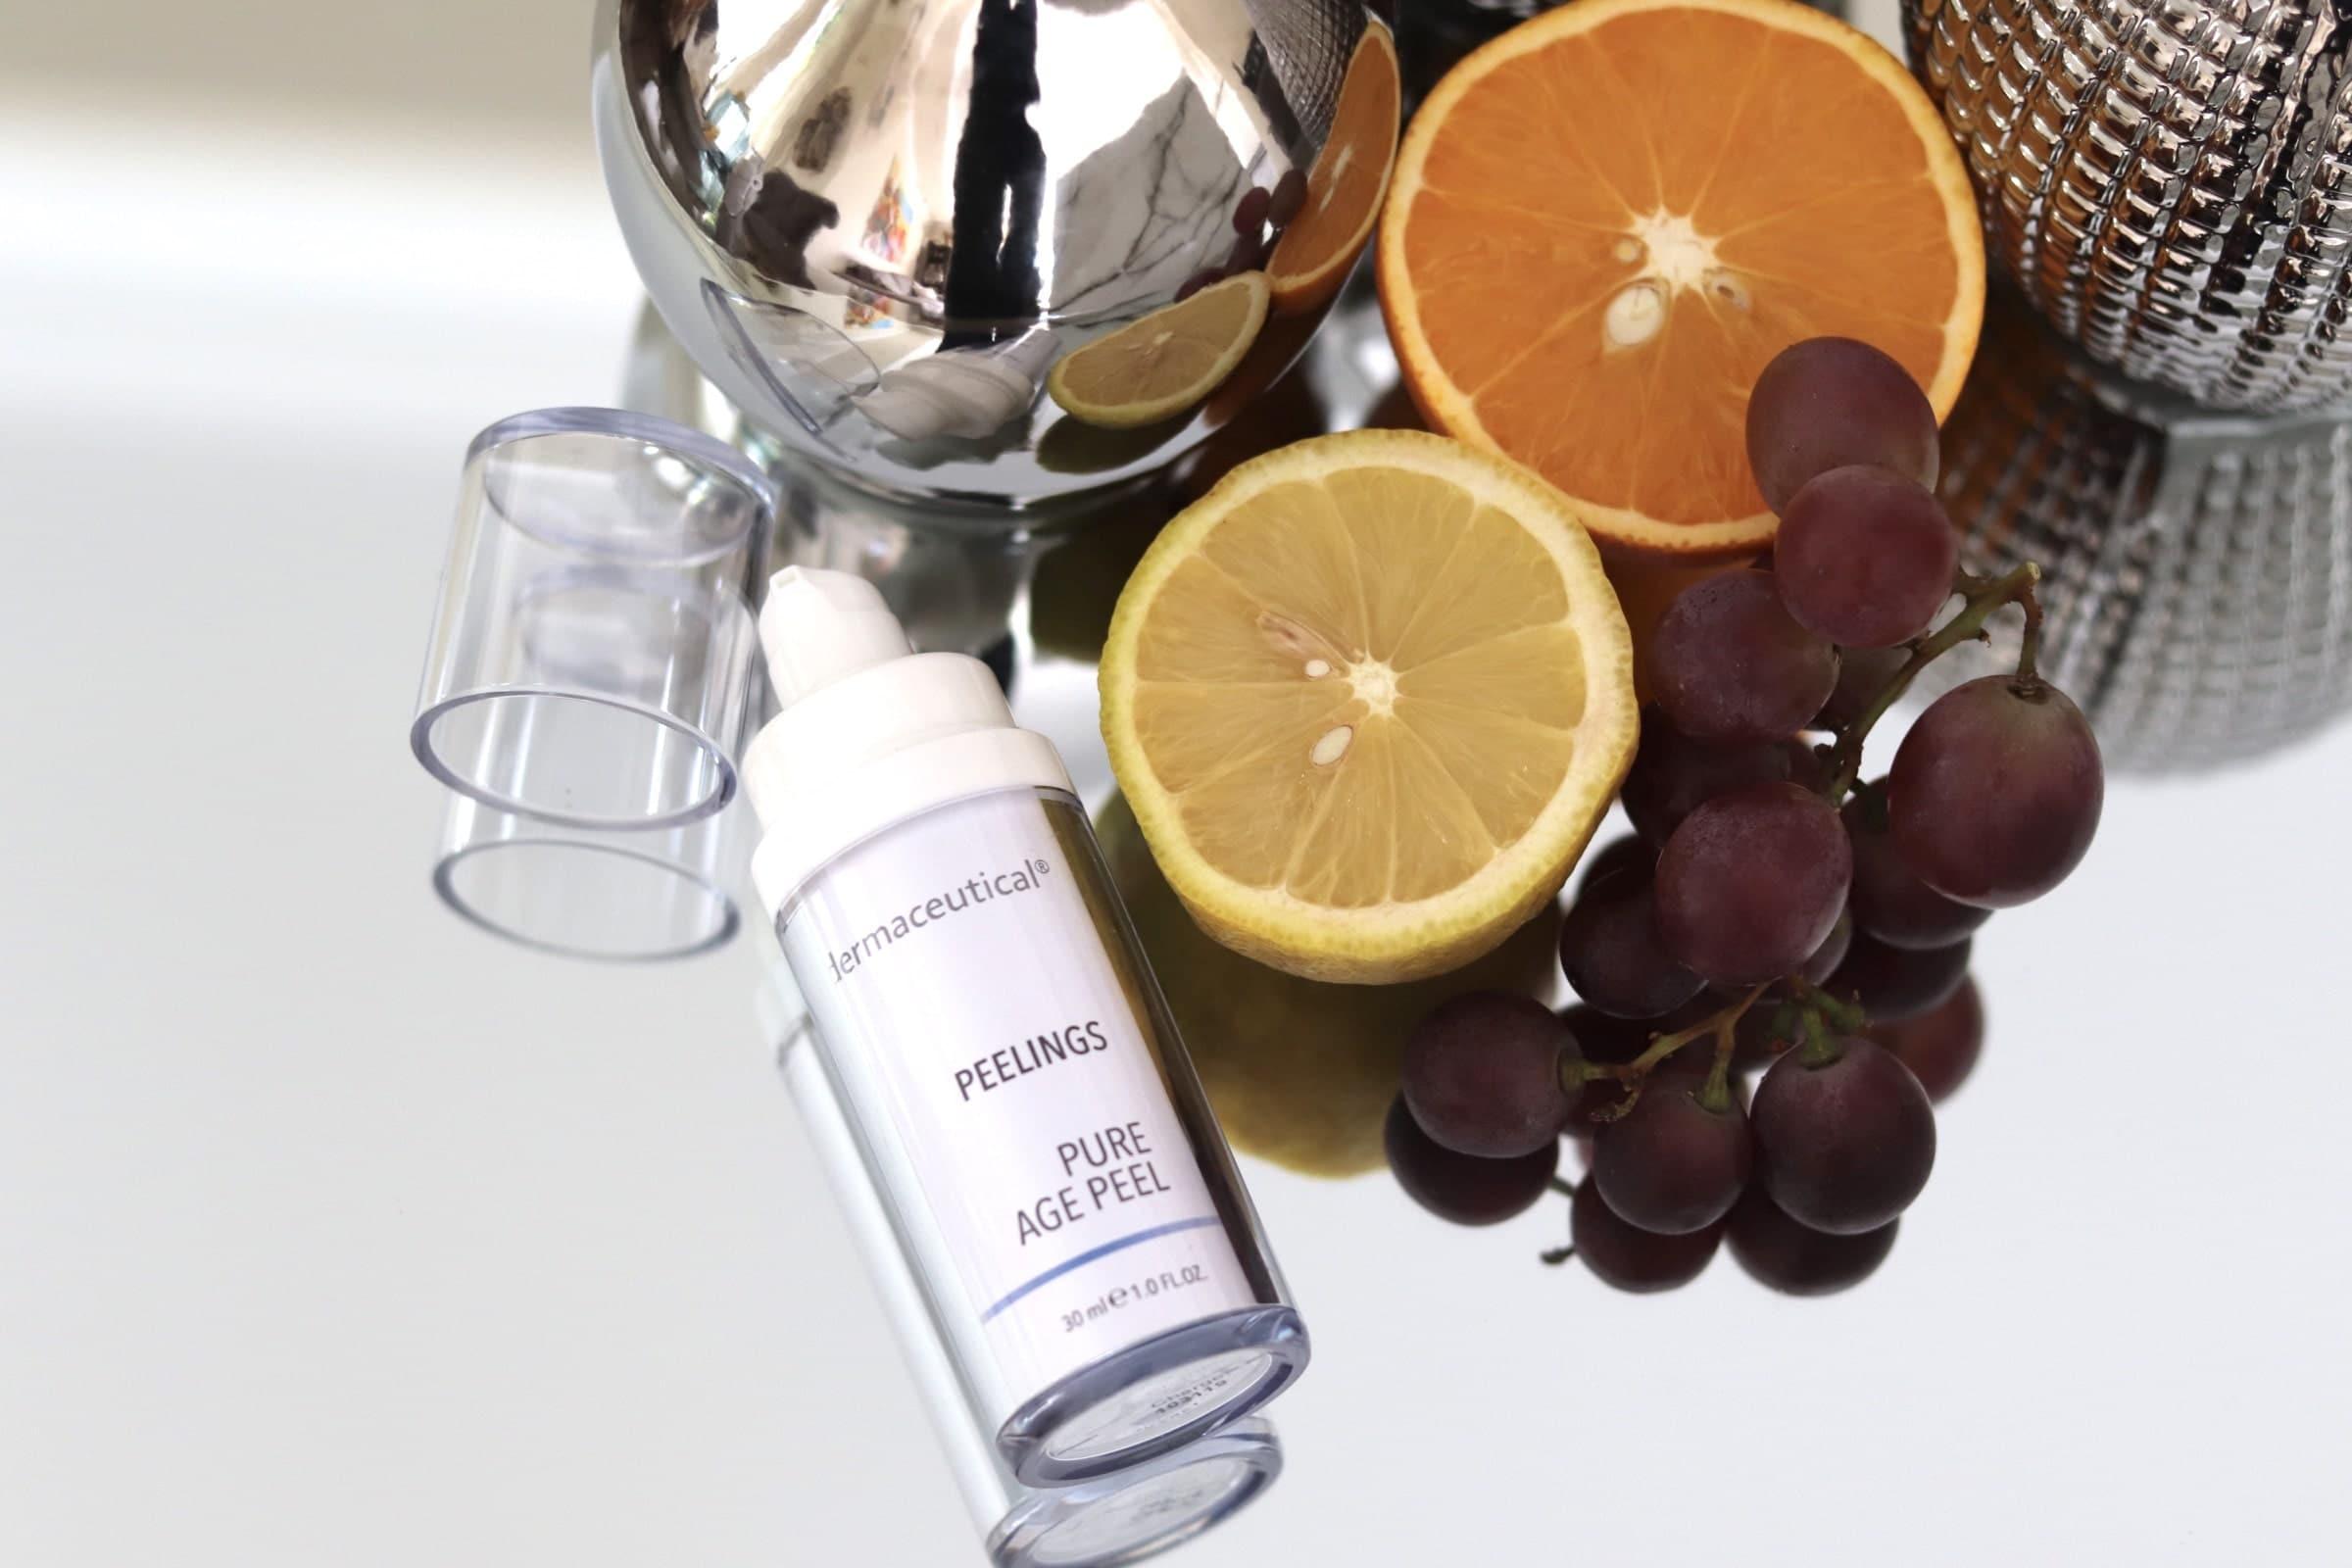 Fruchtsäurepeeling dermaceutical